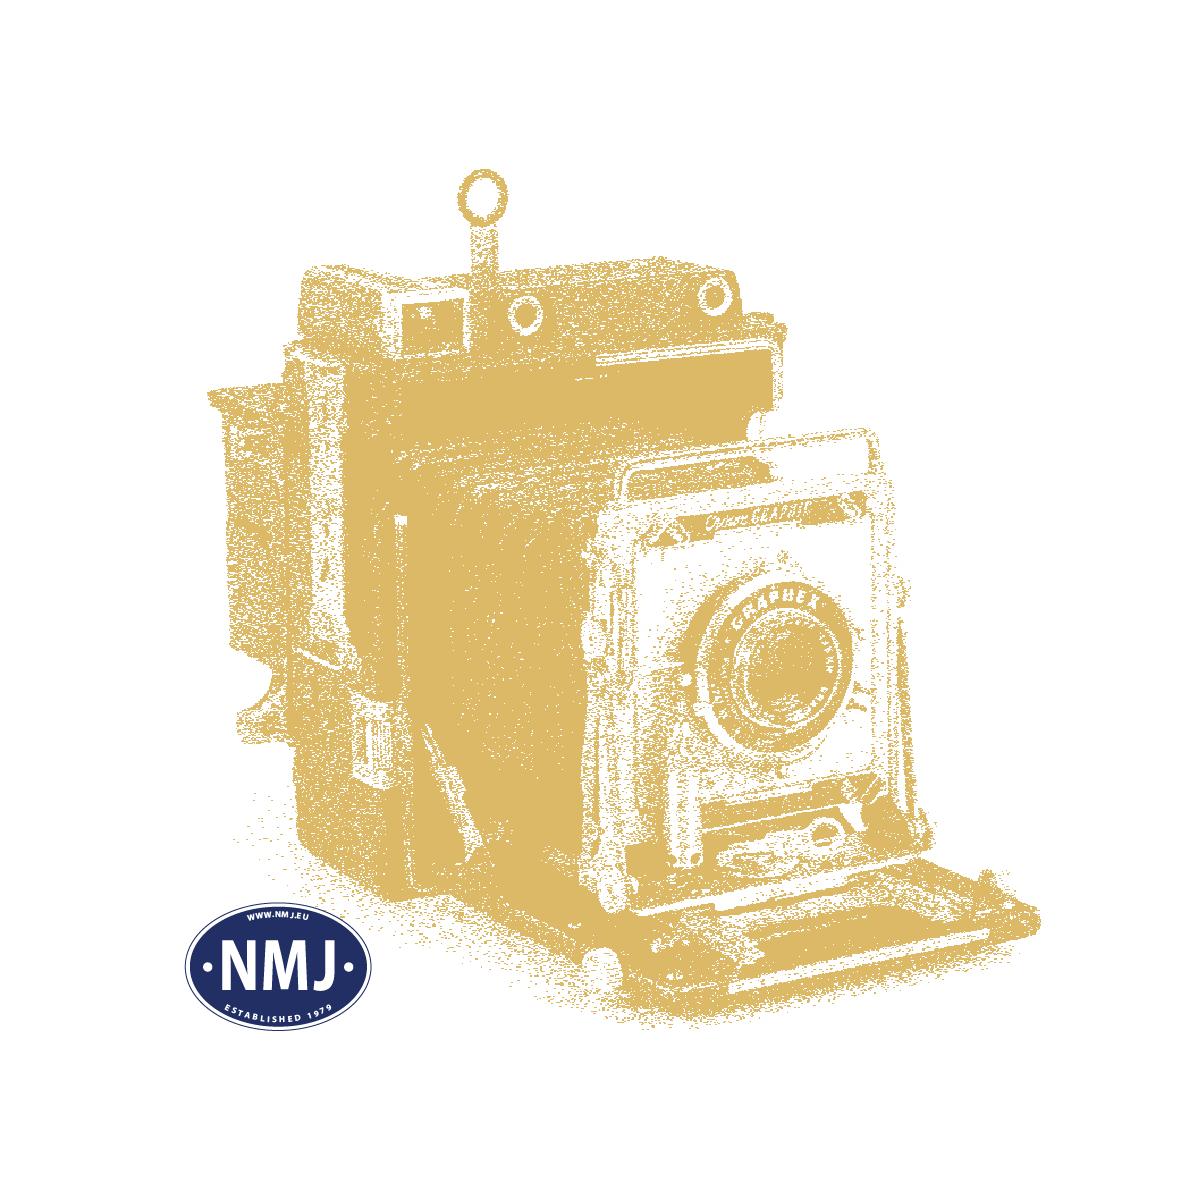 NMJT90040 - NMJ Topline NSB Di3a 631, Nydesign, DCC m/ Lyd og Vitrine